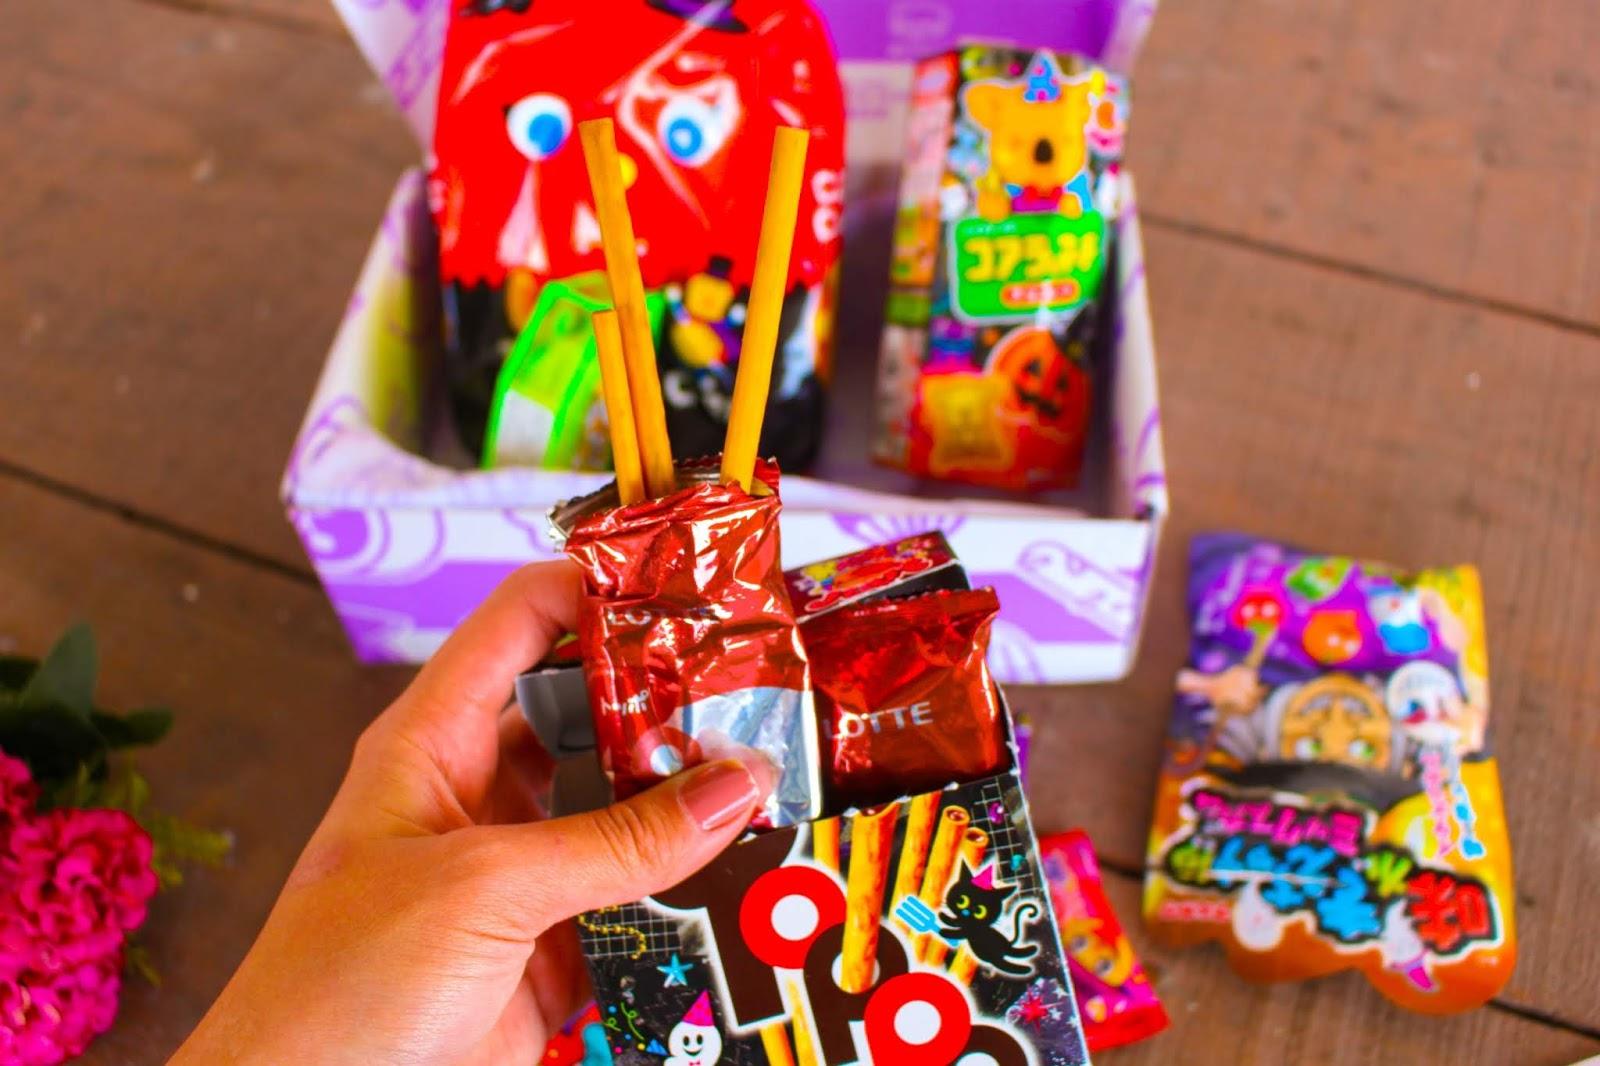 Doces Japoneses: conheça a Japan Candy Box